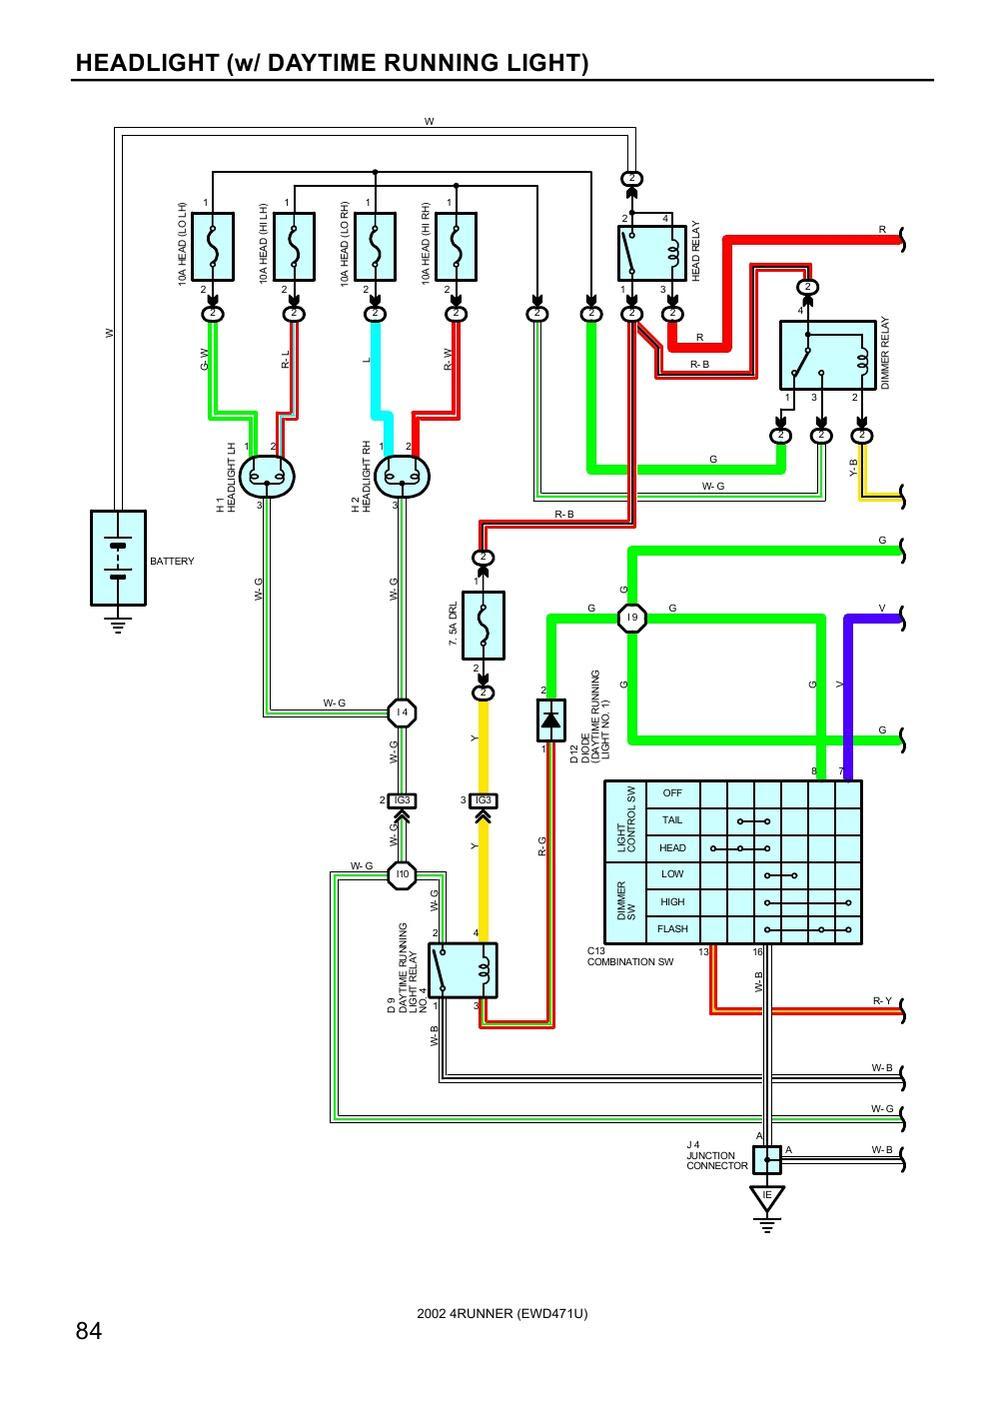 2012 wrangler headlight wiring diagram image 2